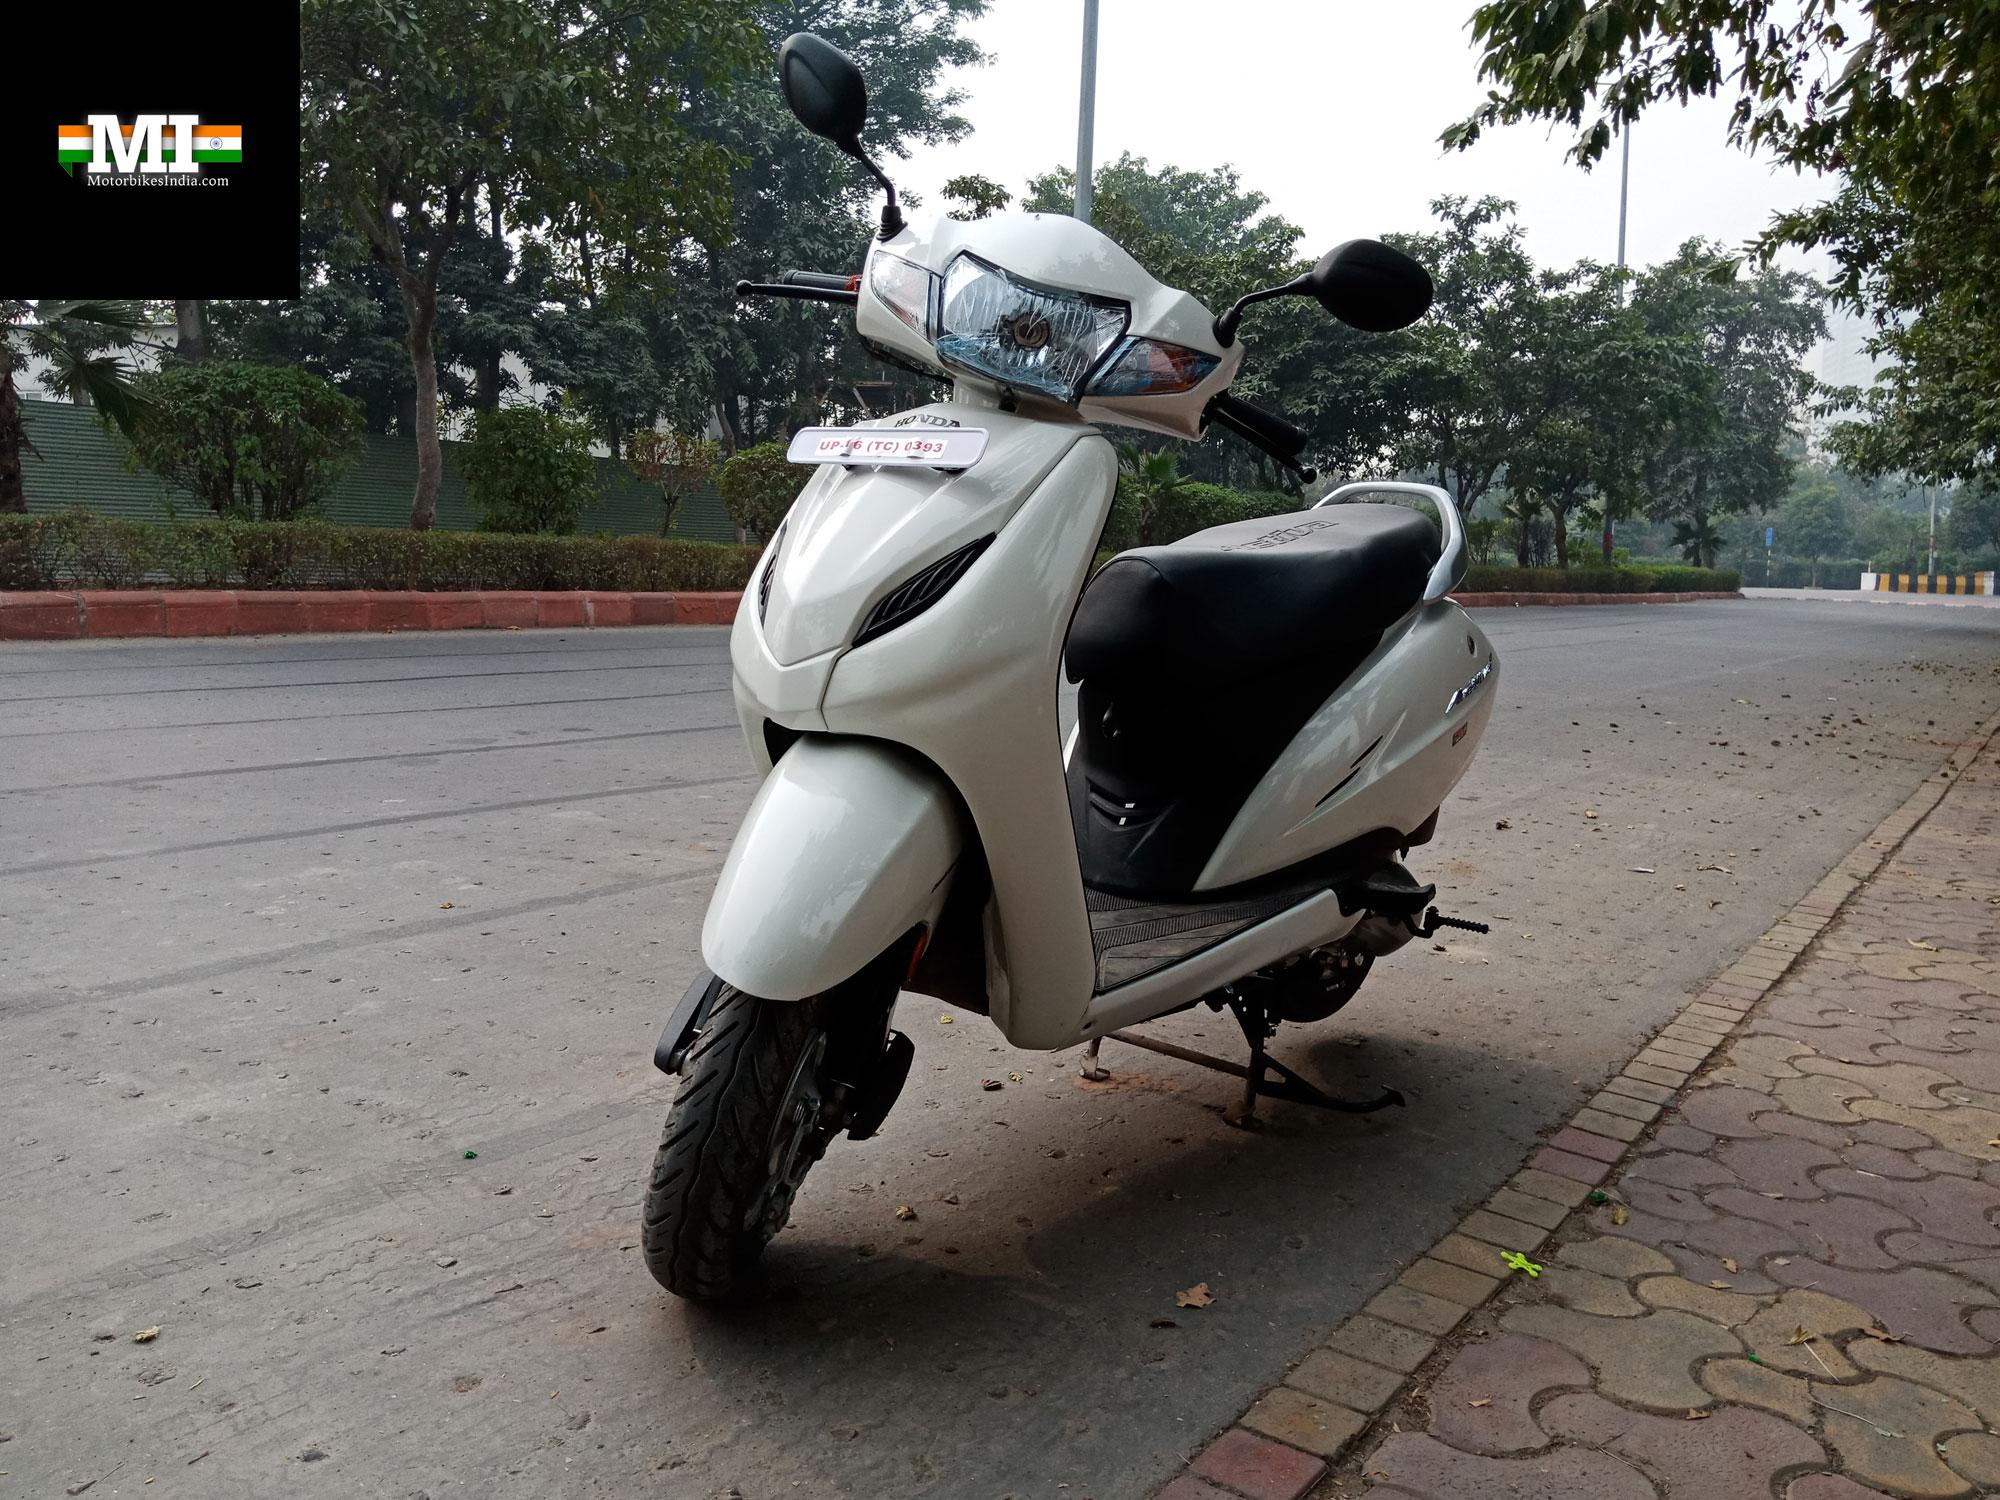 Stupendous Honda Activa 4G Road Test Review Indias Best Selling Evergreenethics Interior Chair Design Evergreenethicsorg